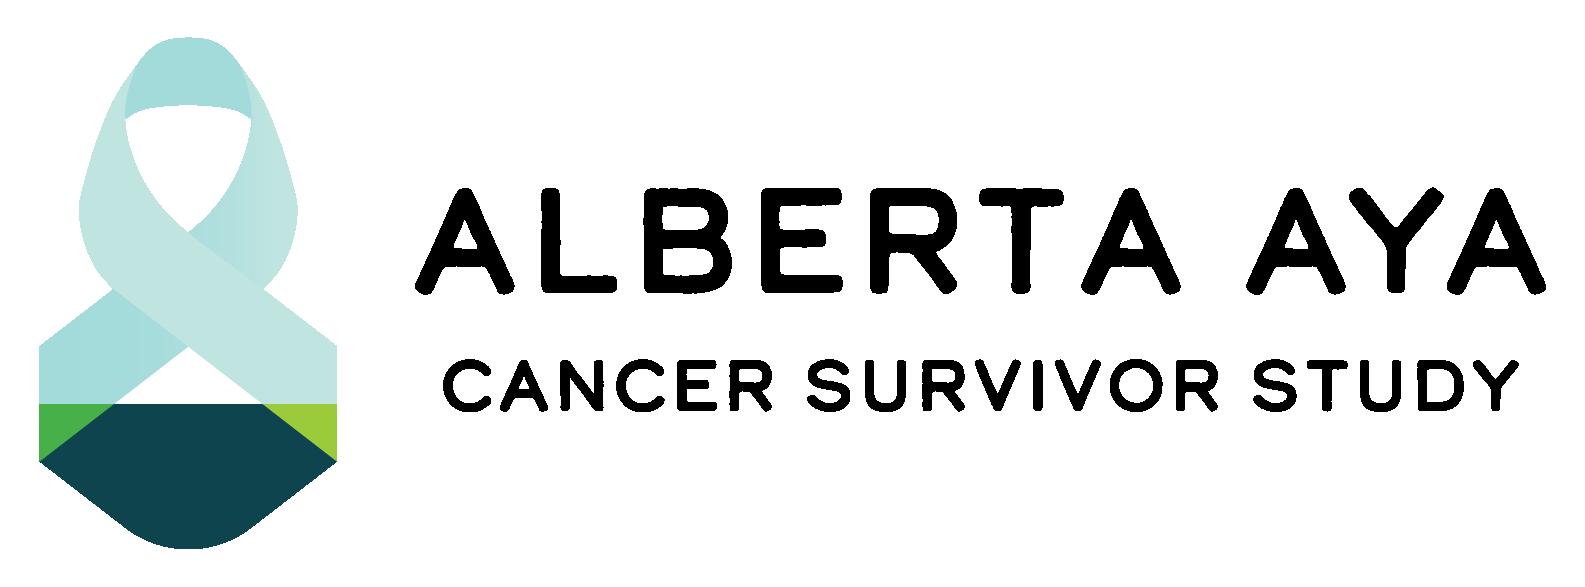 ALBERTA ADOLESCENT AND YOUNG ADULT CANCER SURVIVOR STUDY logo